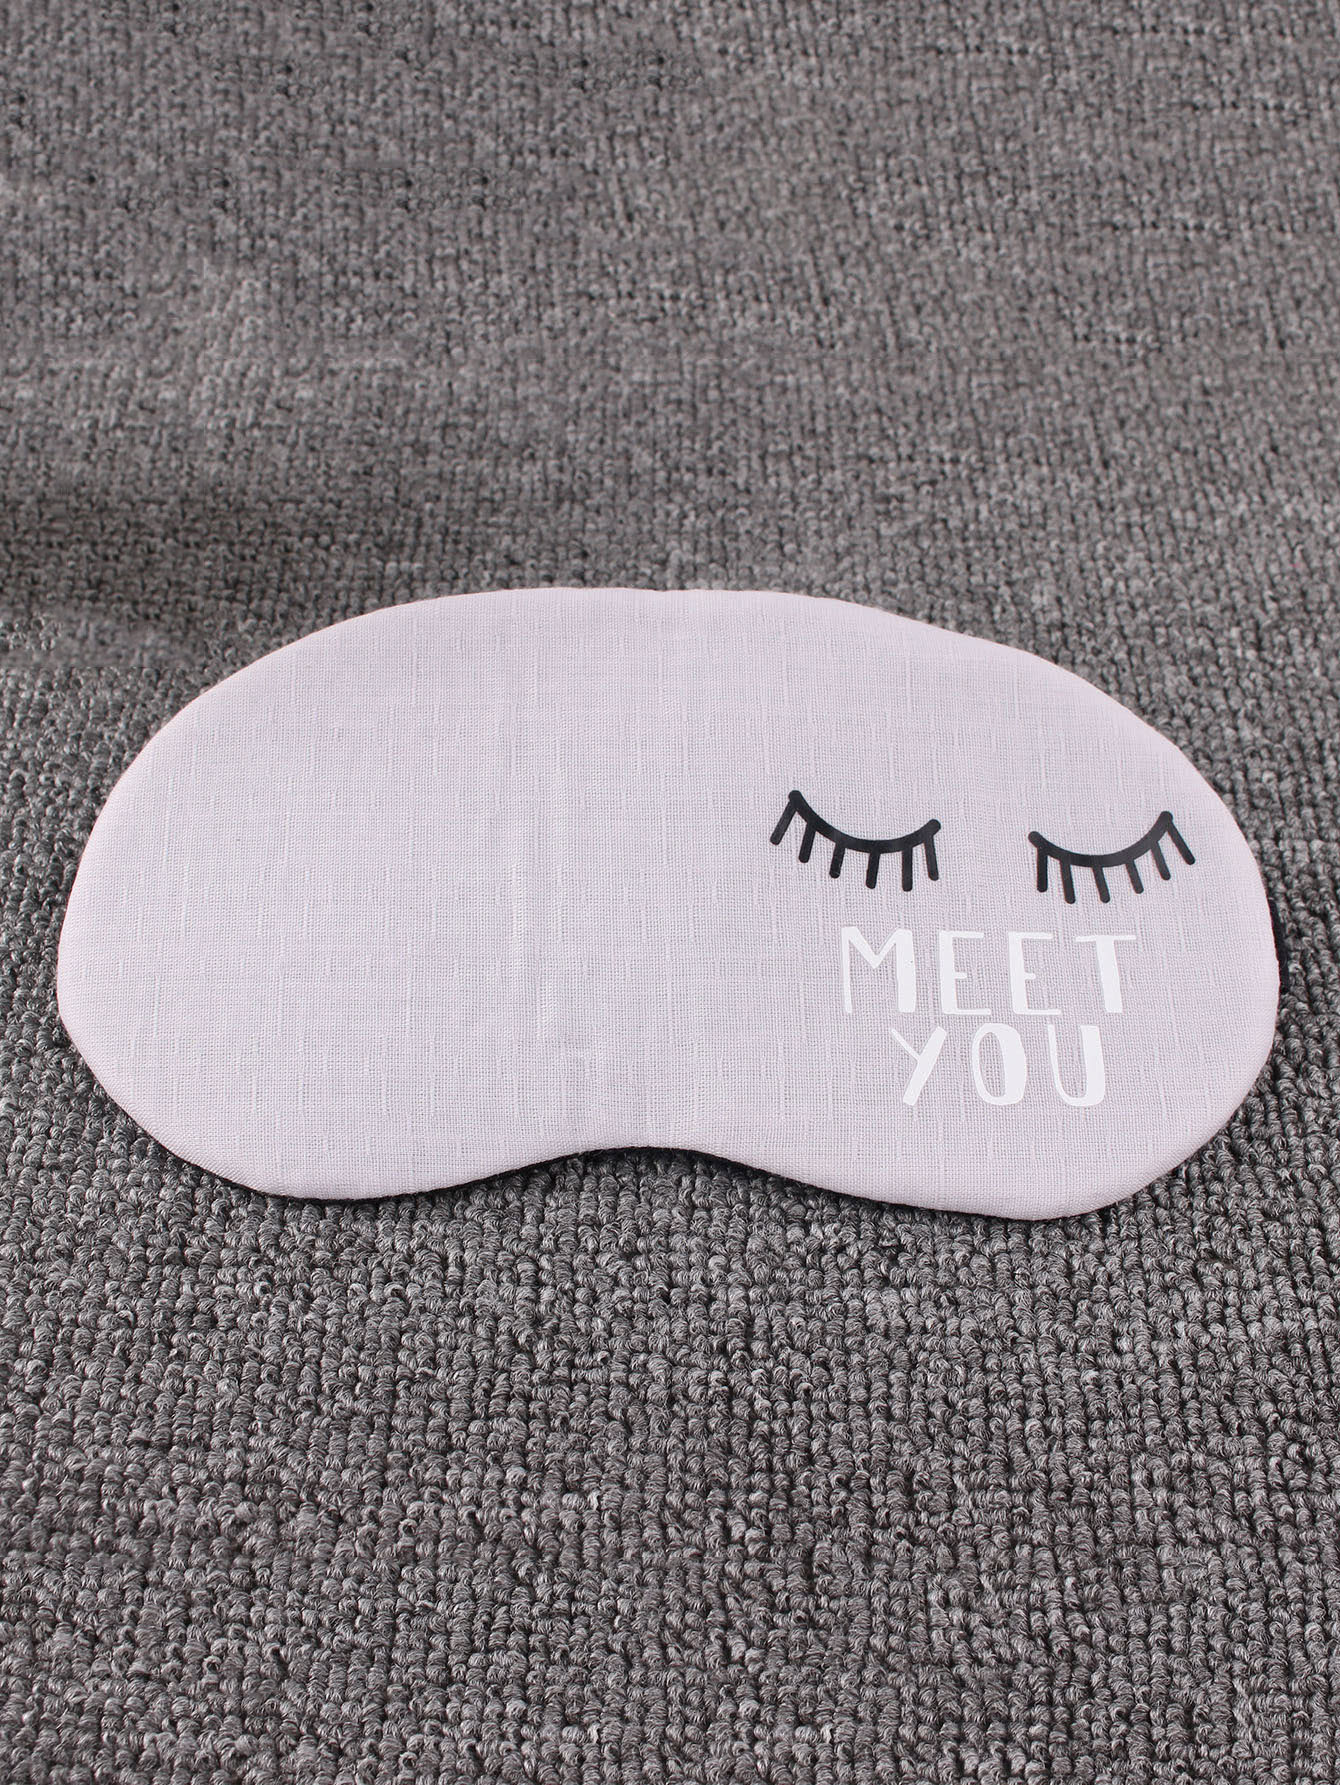 Eyelashes Print Rest Aid Cover Eye Mask 1Pc